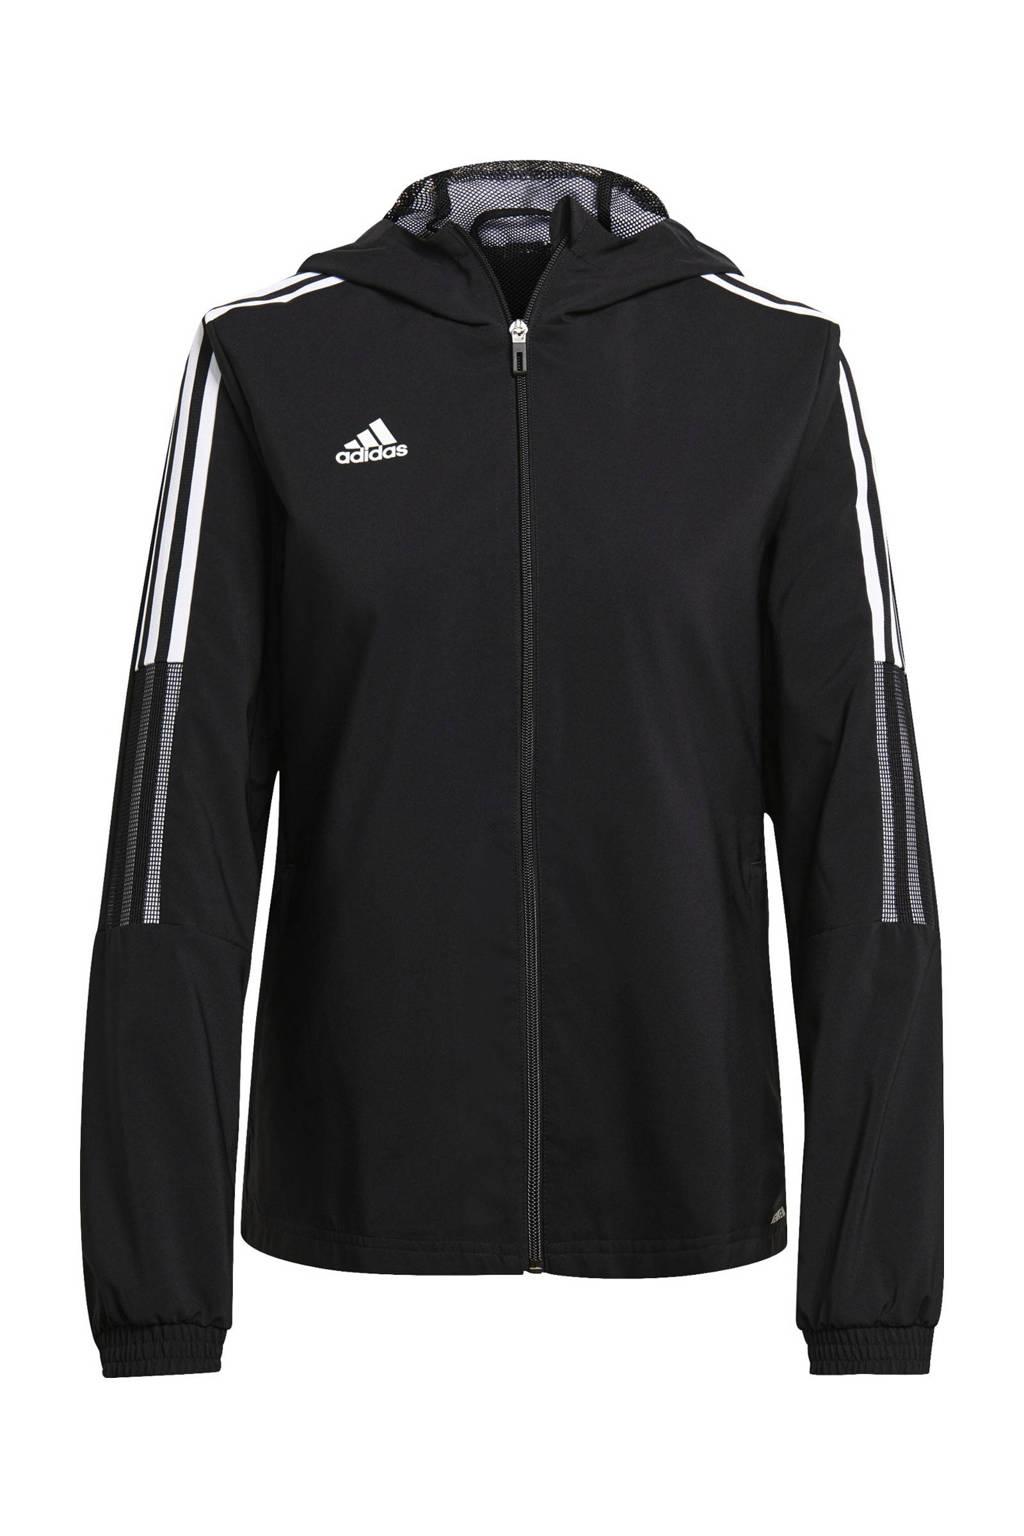 adidas Performance Tiro 21 voetbaljack zwart, Zwart